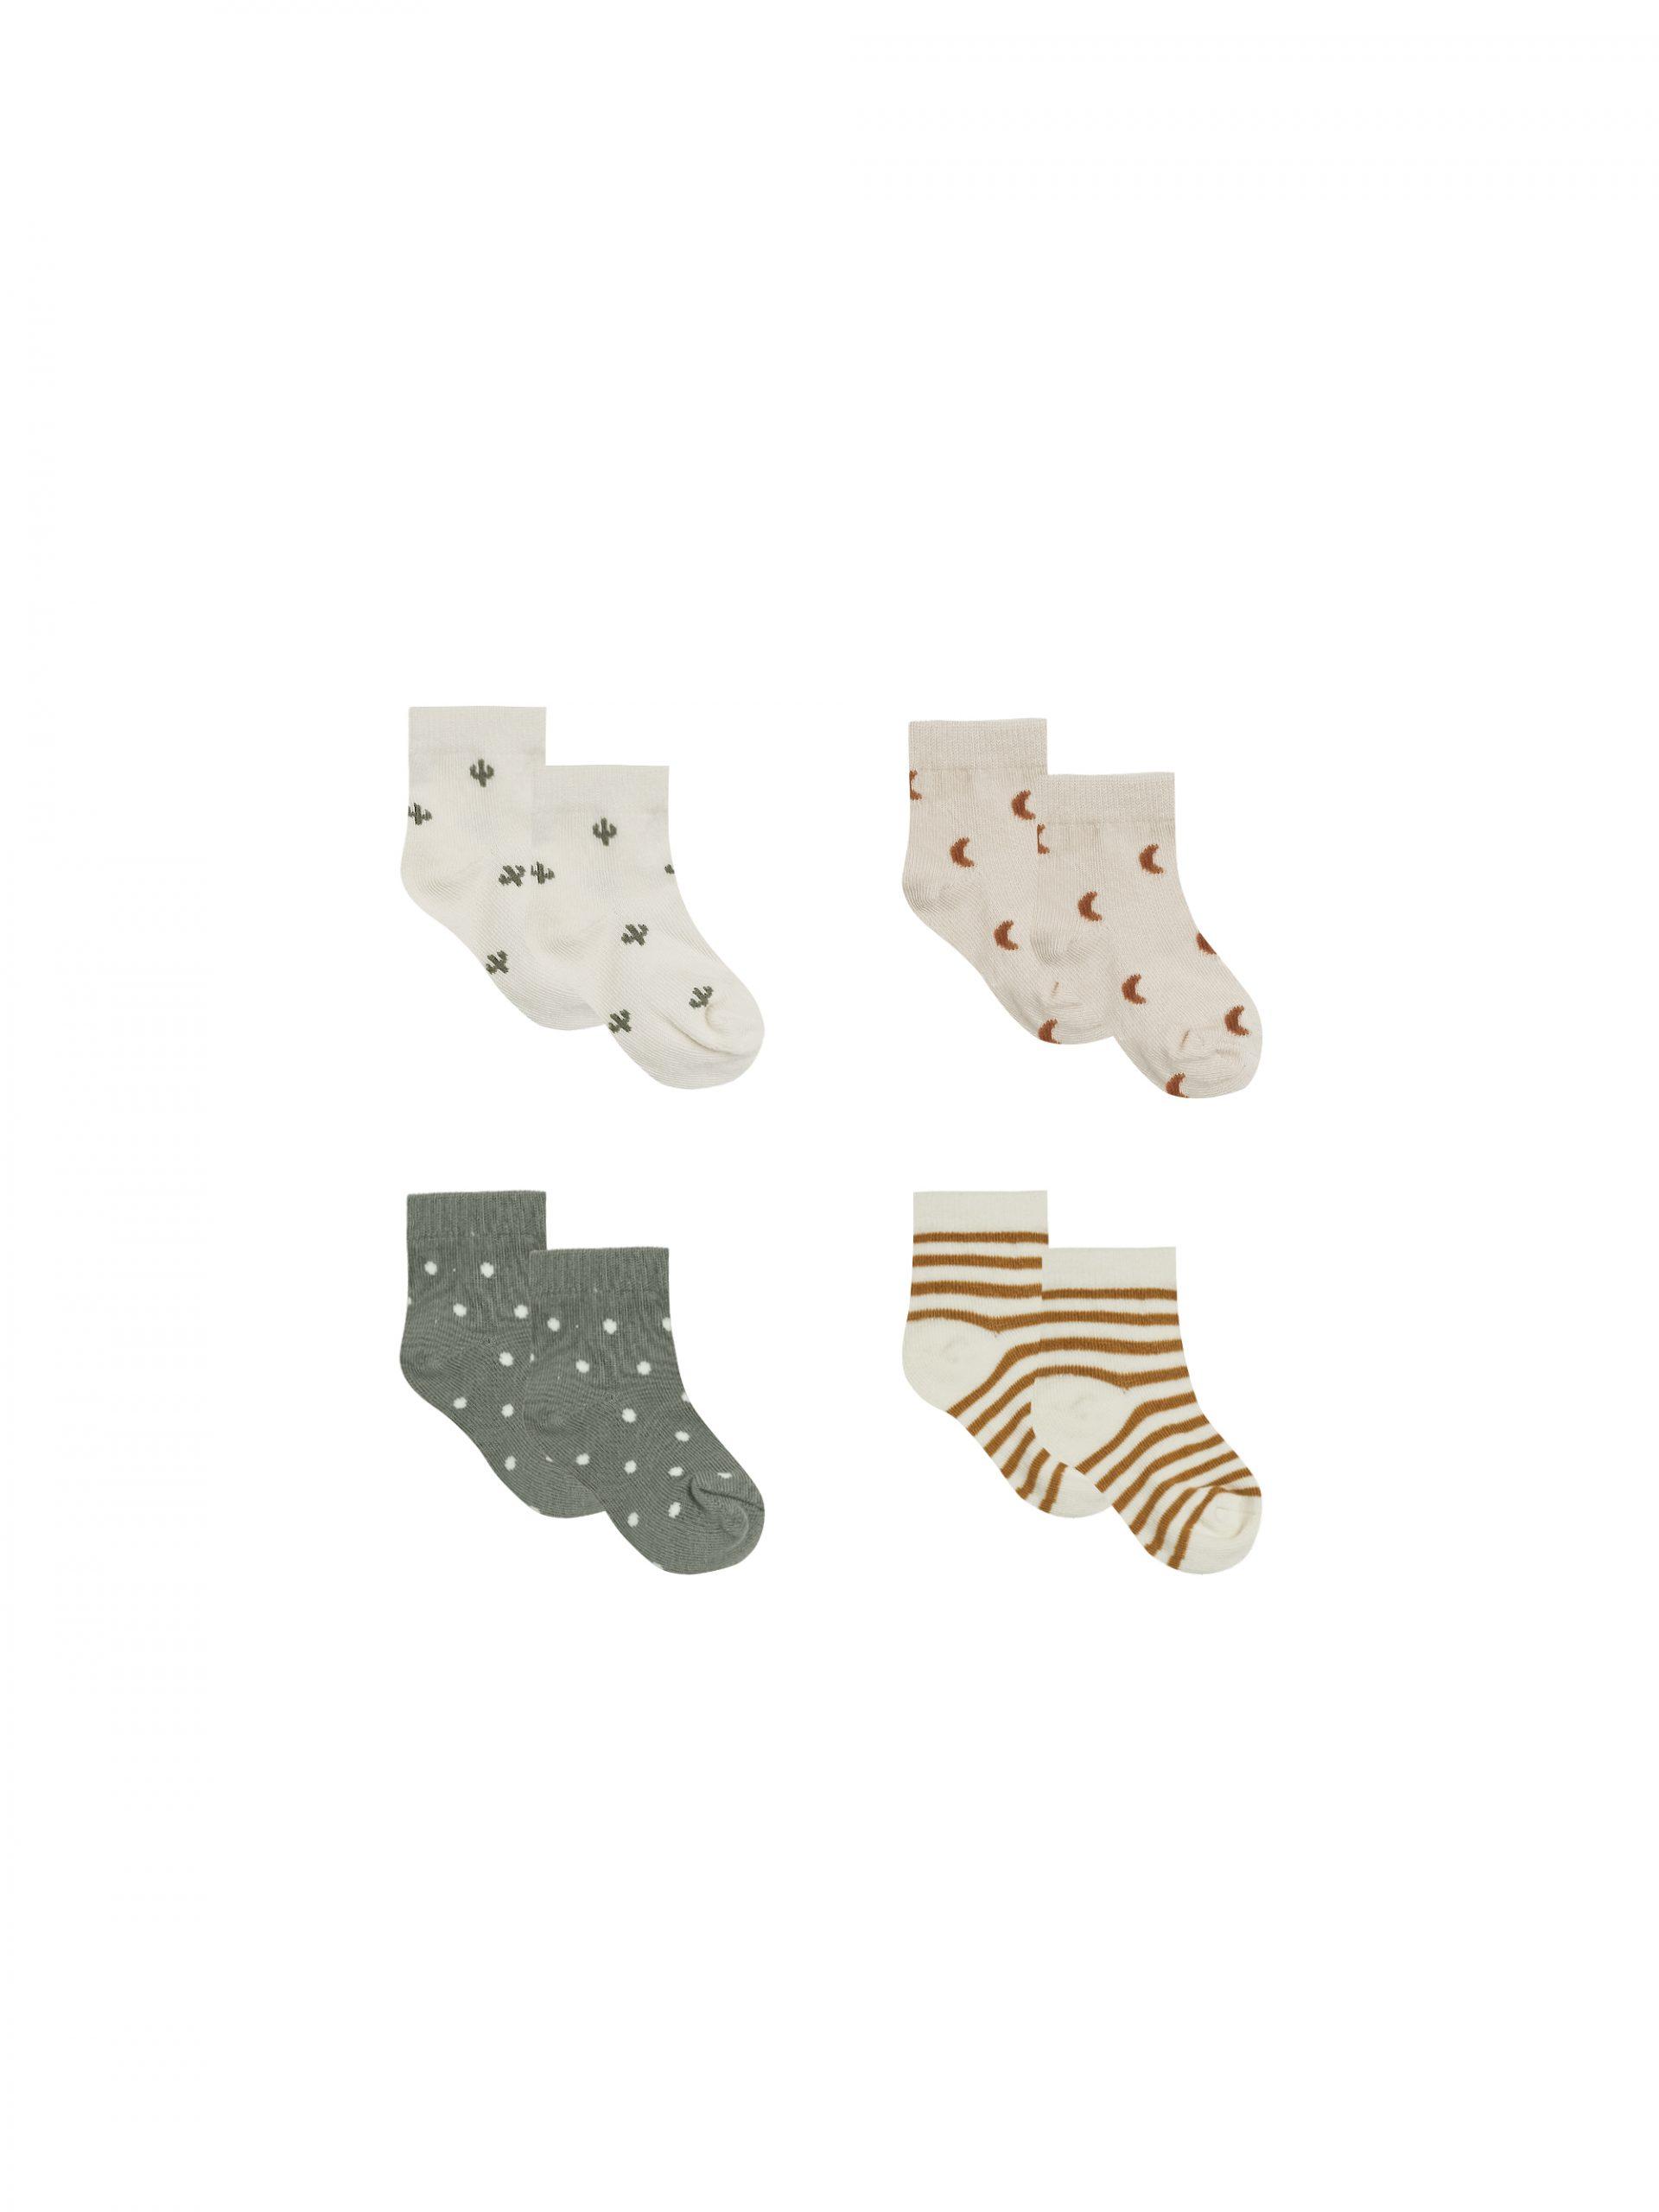 Quincy Mae Printed Socks 4 Pack (ivory,walnut,natural,basil)**PRE ORDER